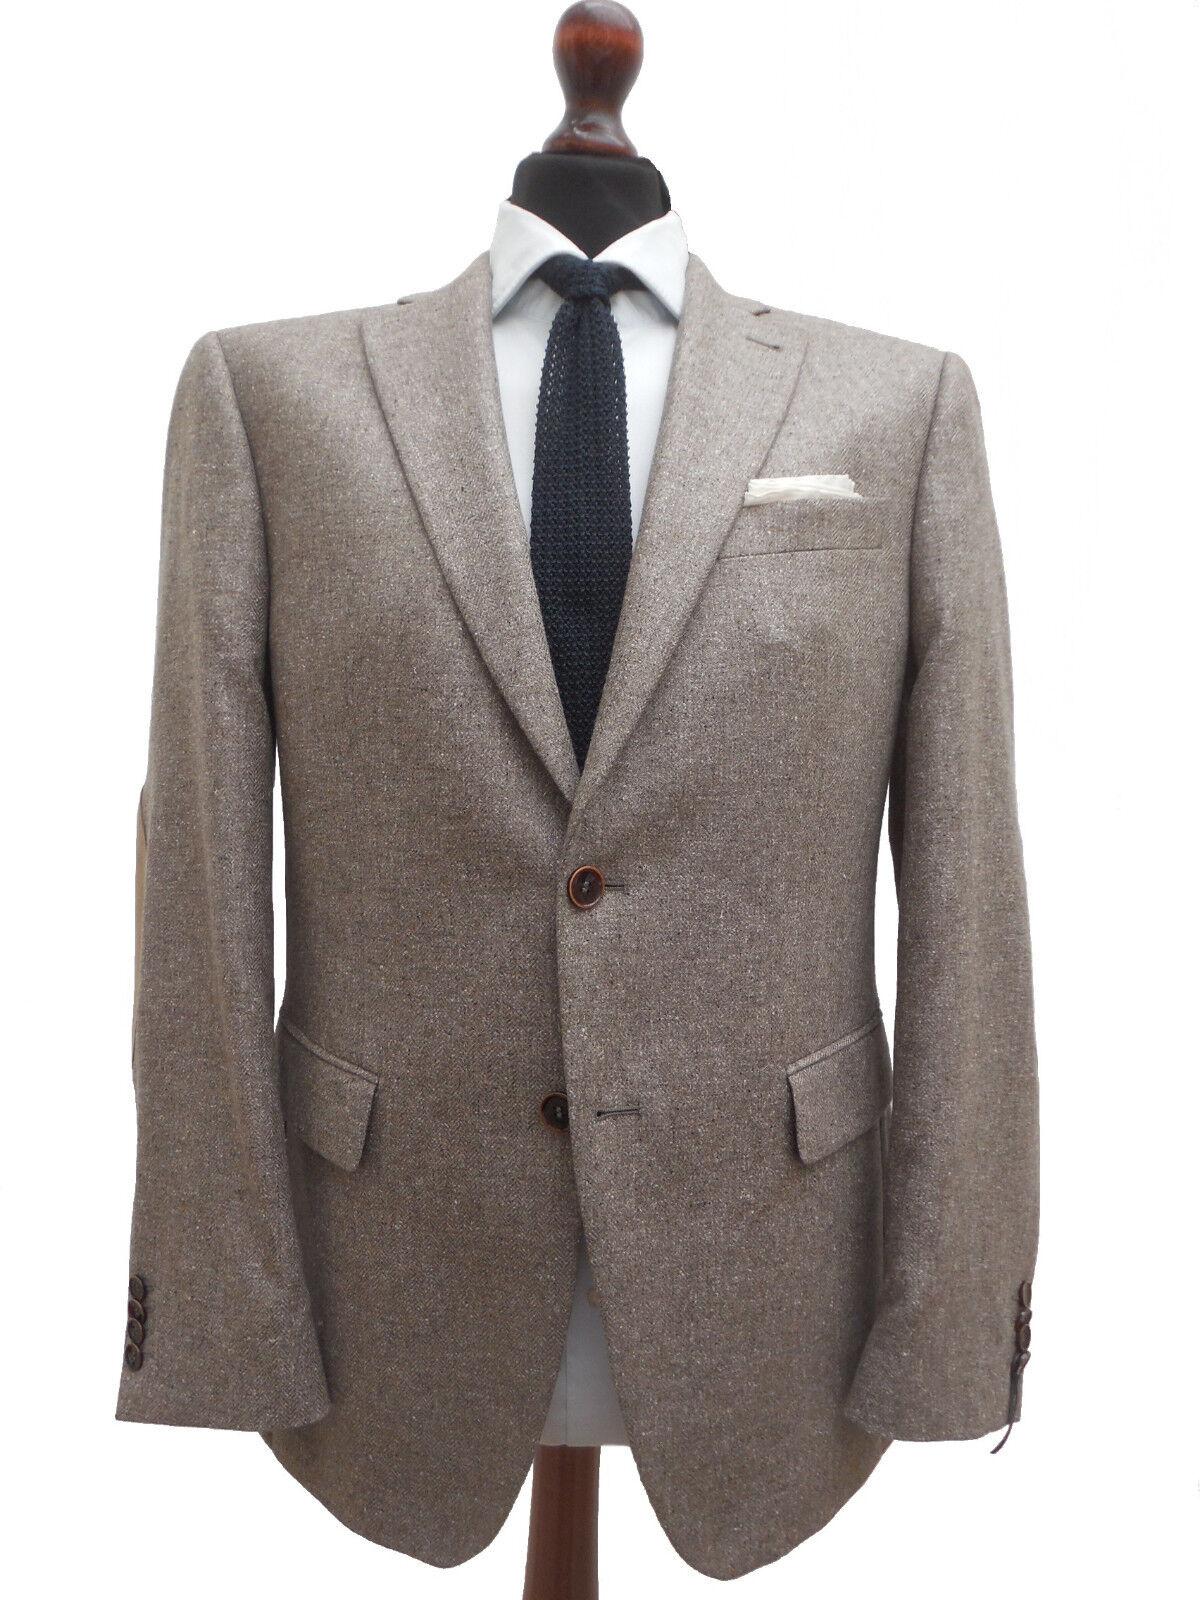 BARUTTI 100% Seide Sakko Gr. 24 pure silk mit Armpatches Neuwertig